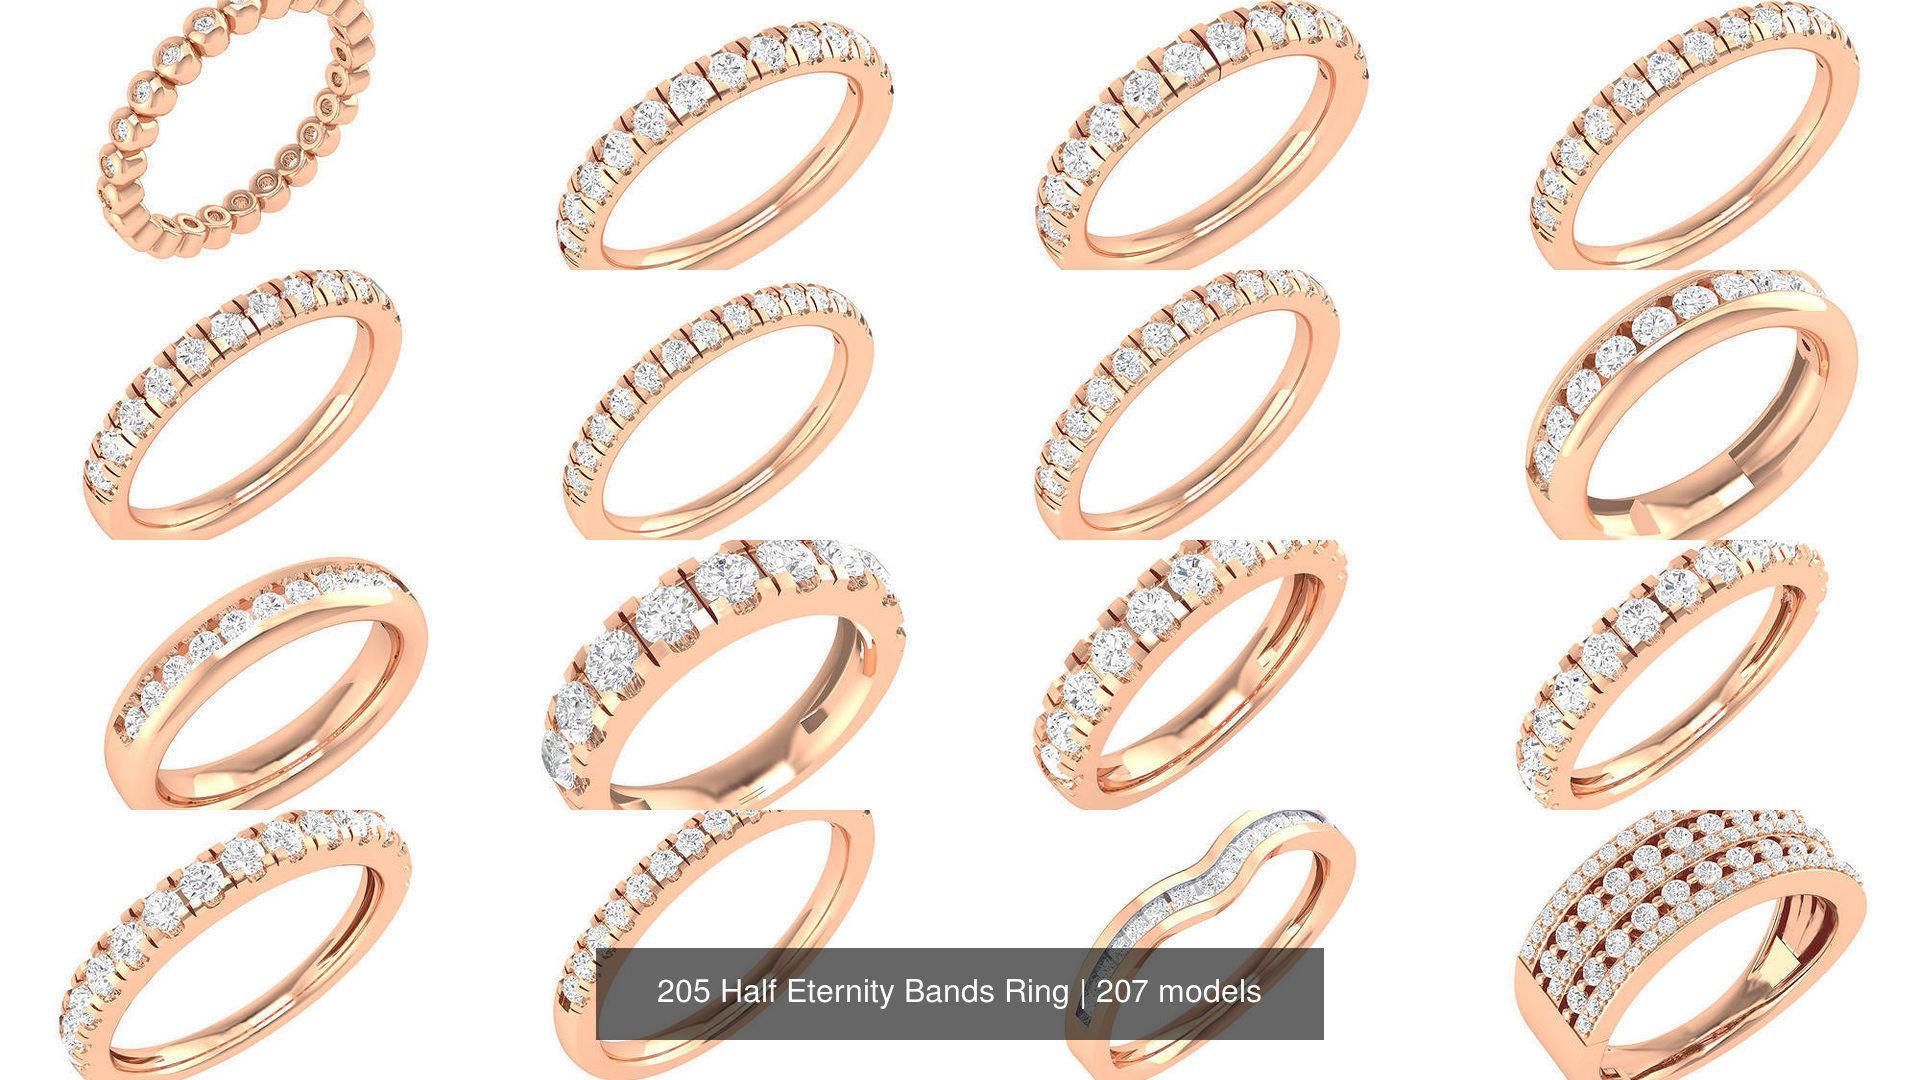 205 Half Eternity Bands Ring